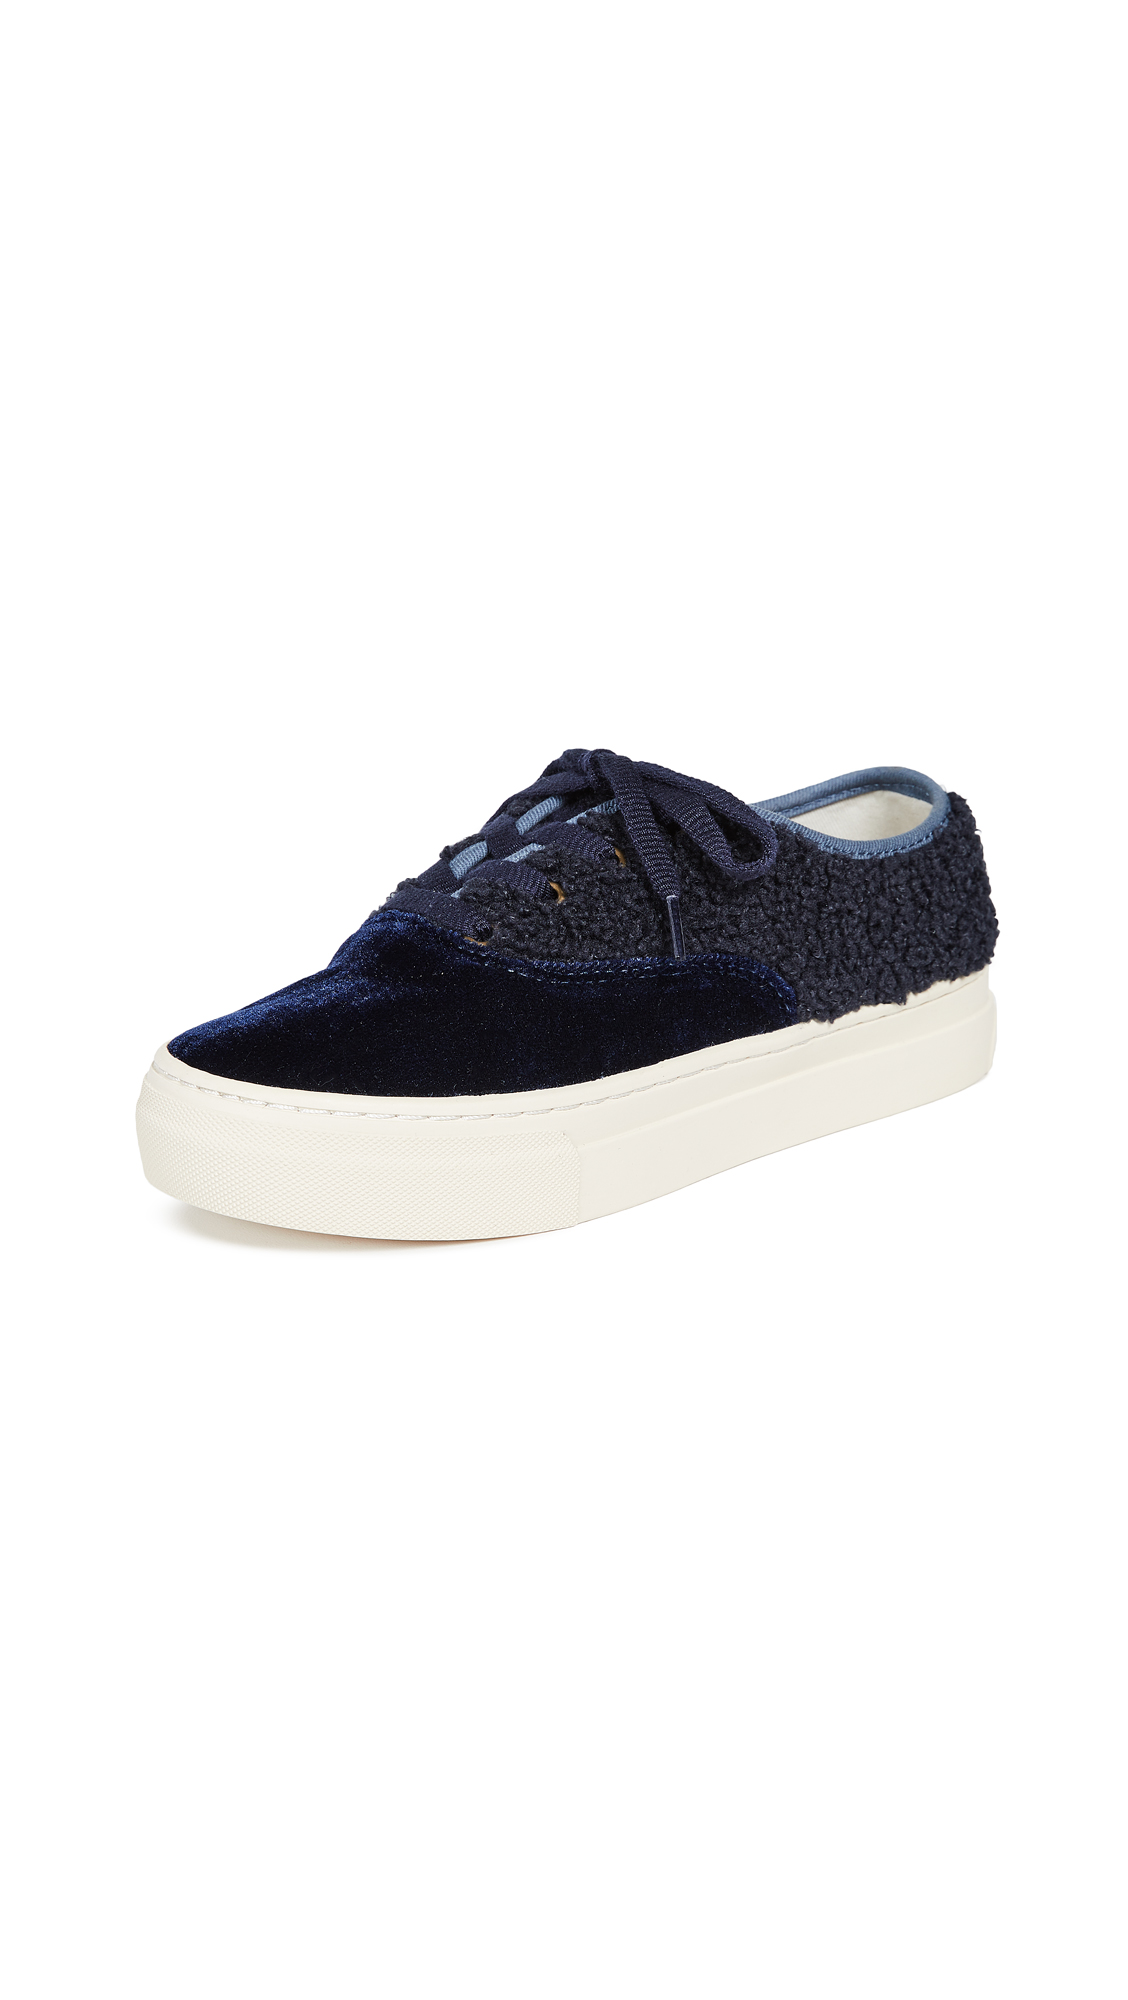 Soludos Porto Platform Velvet Sneakers - Midnight Blue